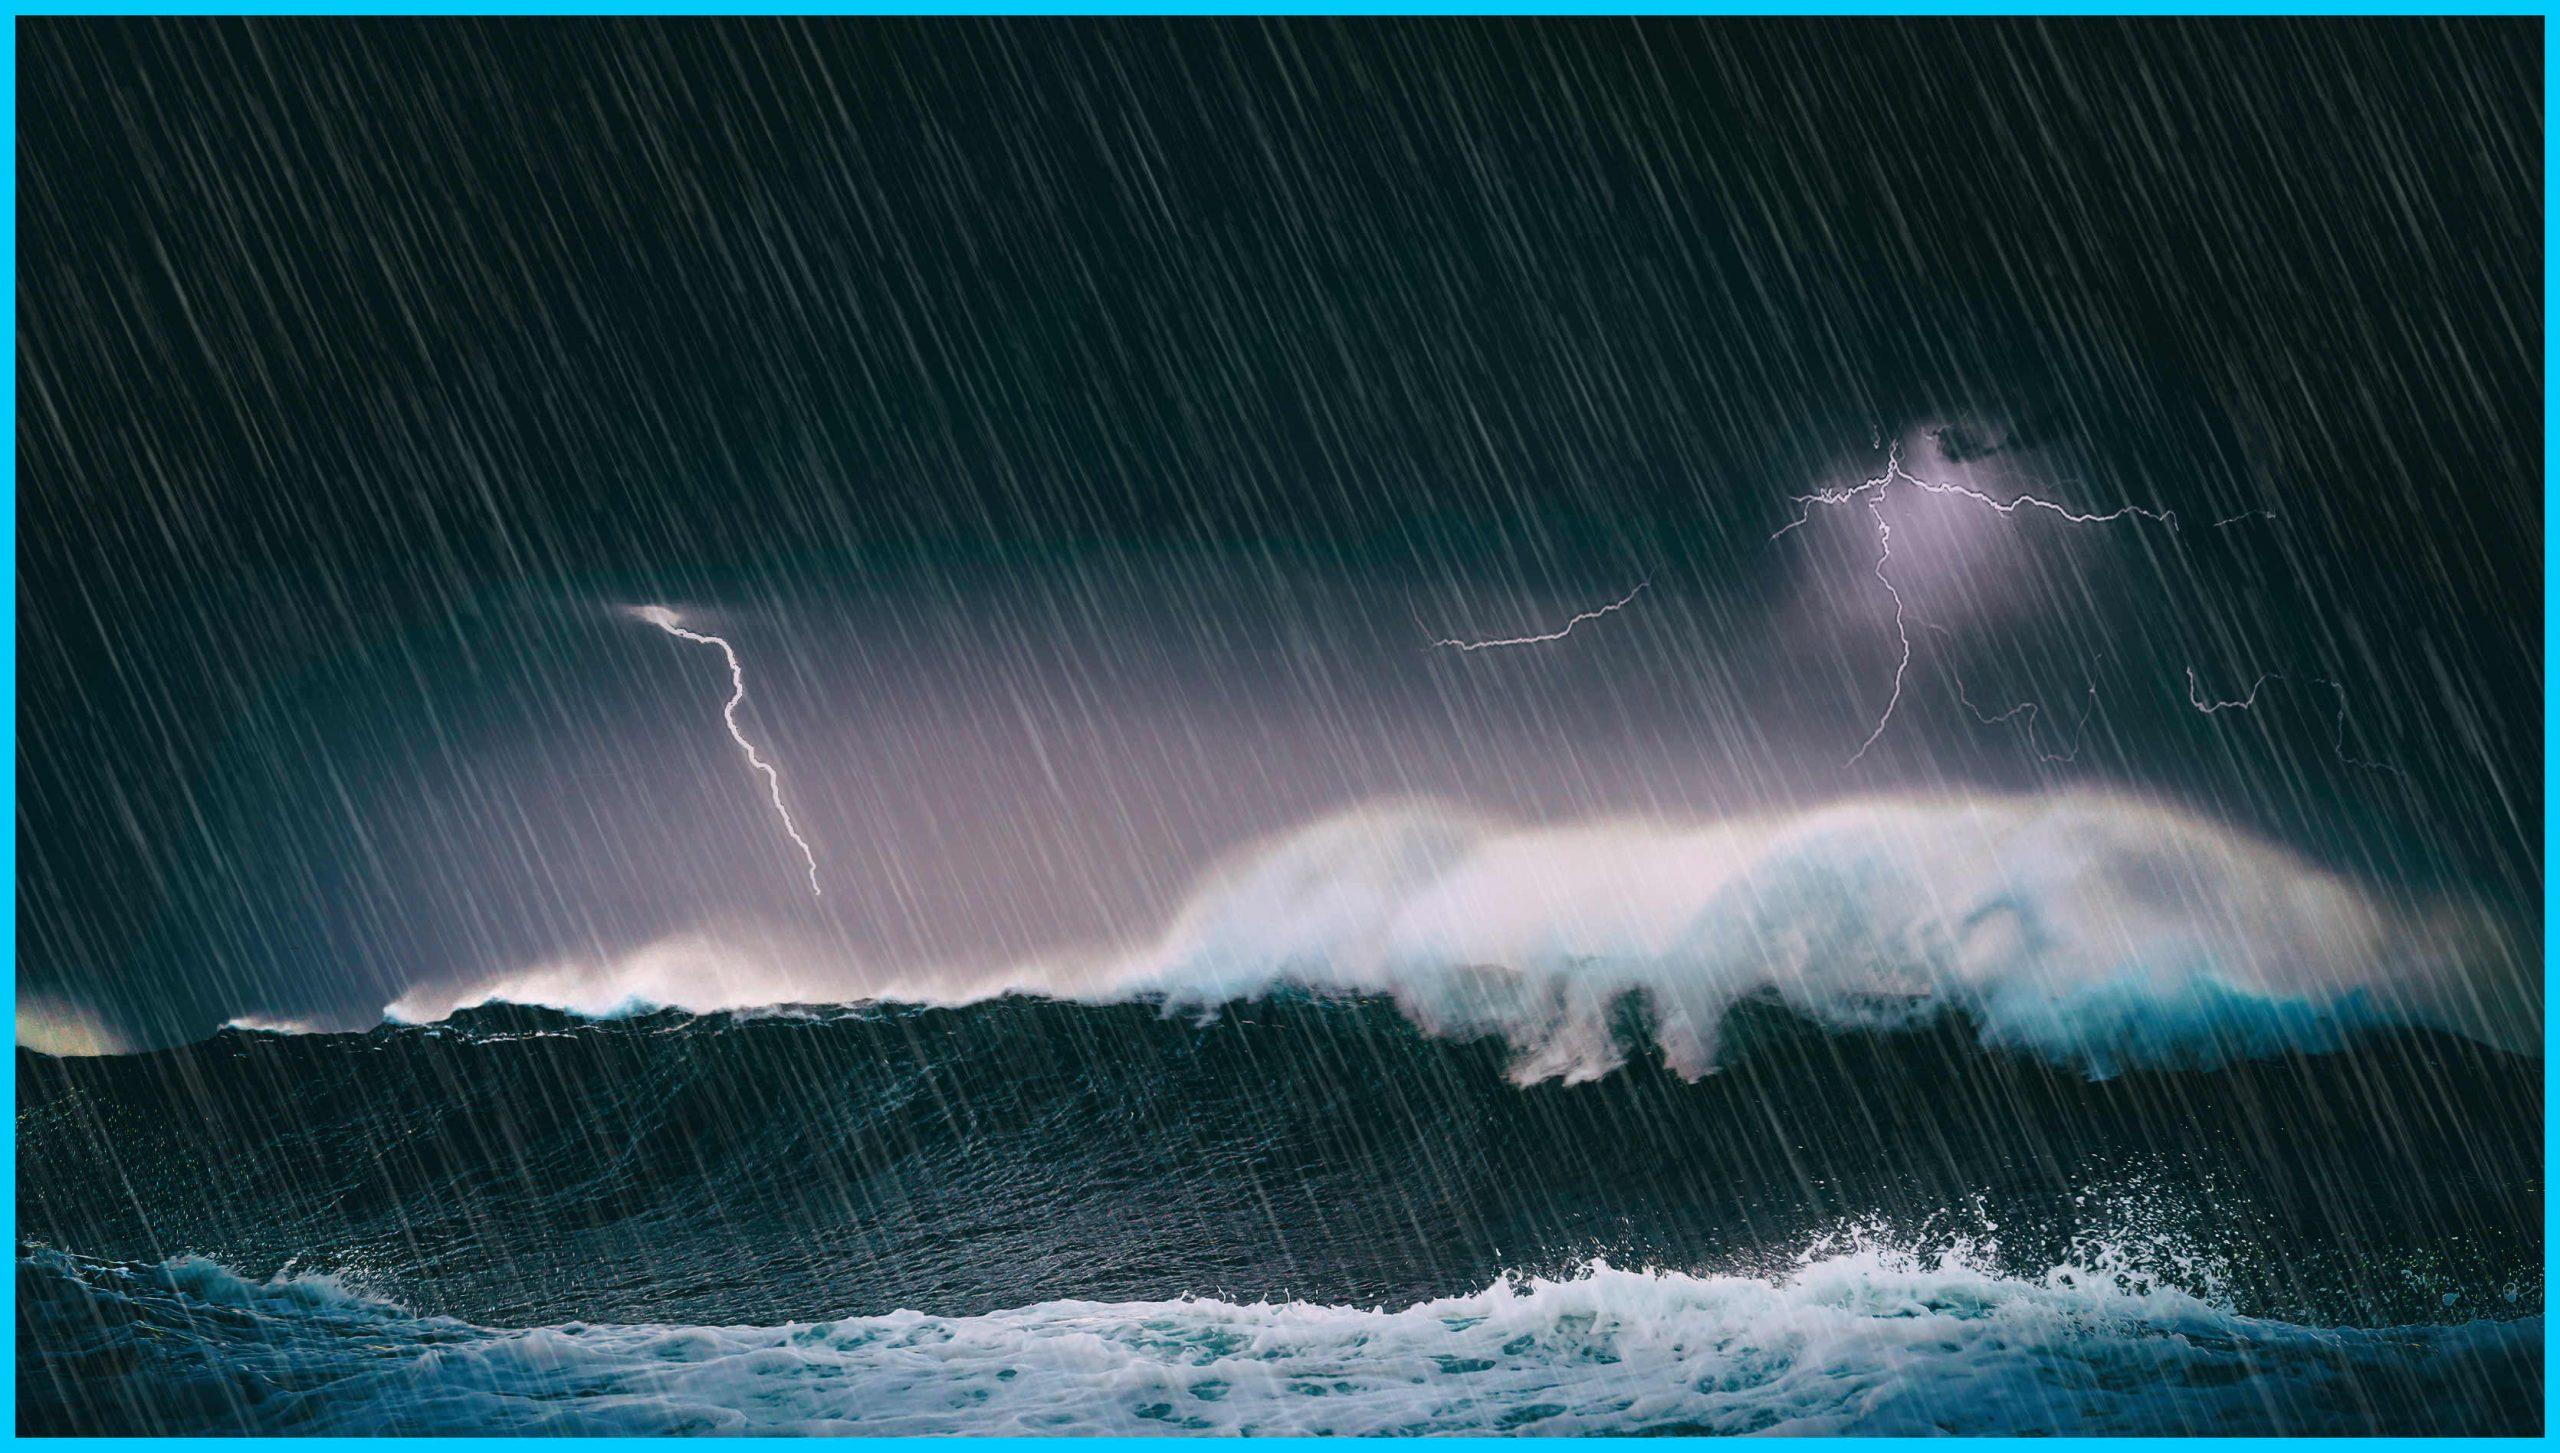 Stormy seas, dark skies, rain and lightening